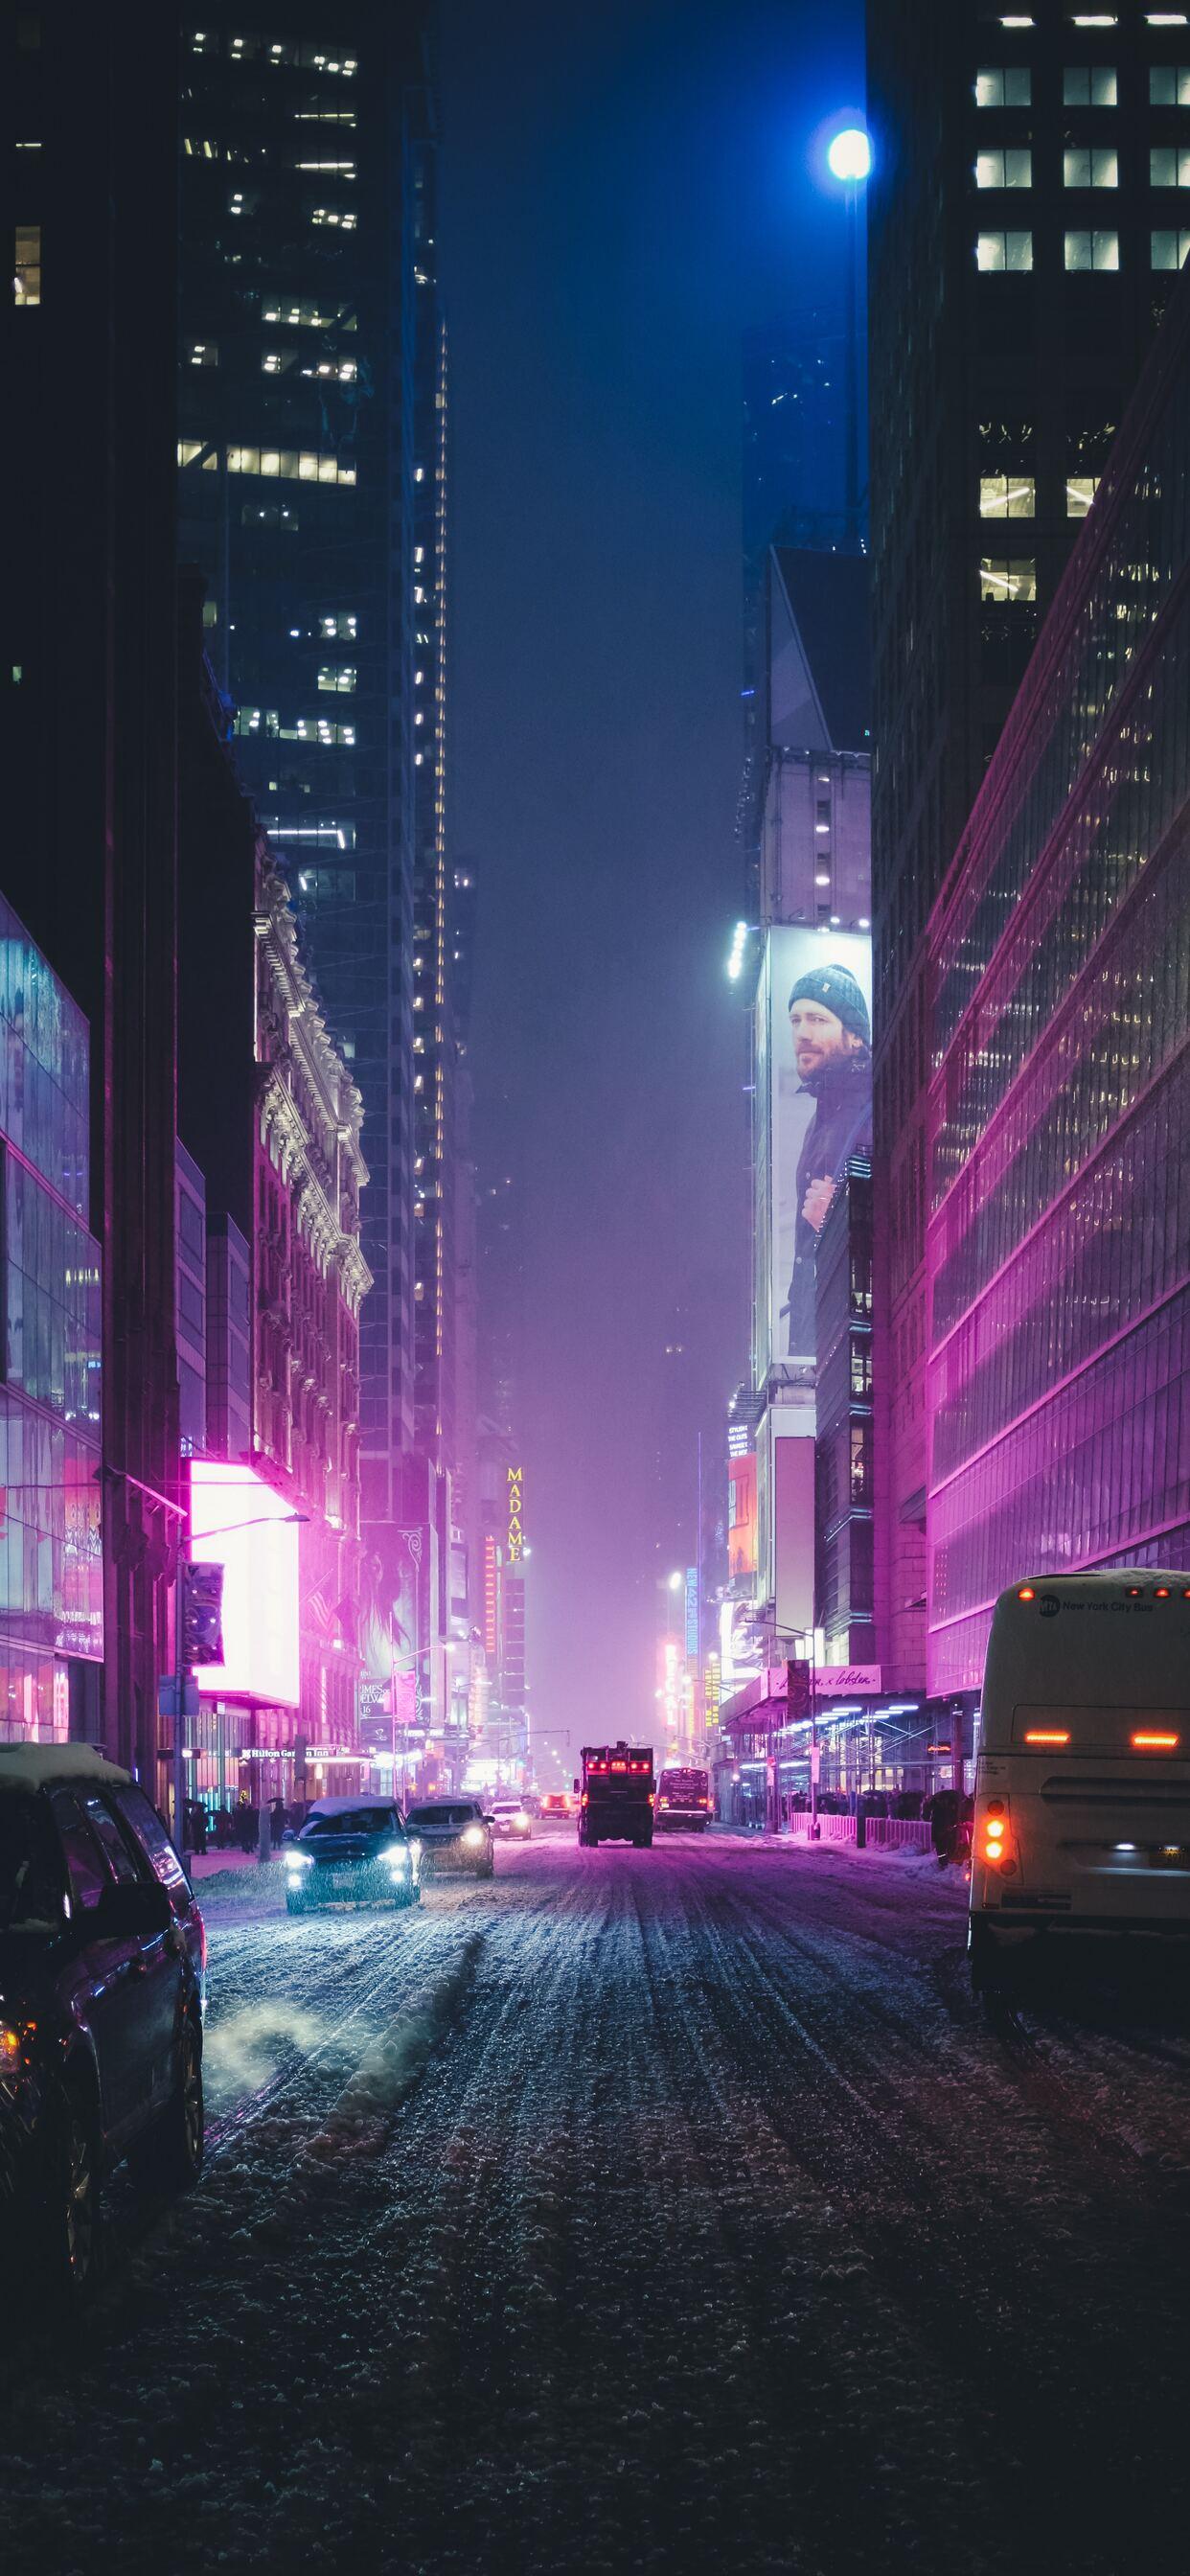 1242x2688 Night City Street Neon Lights 4k Iphone Xs Max Hd